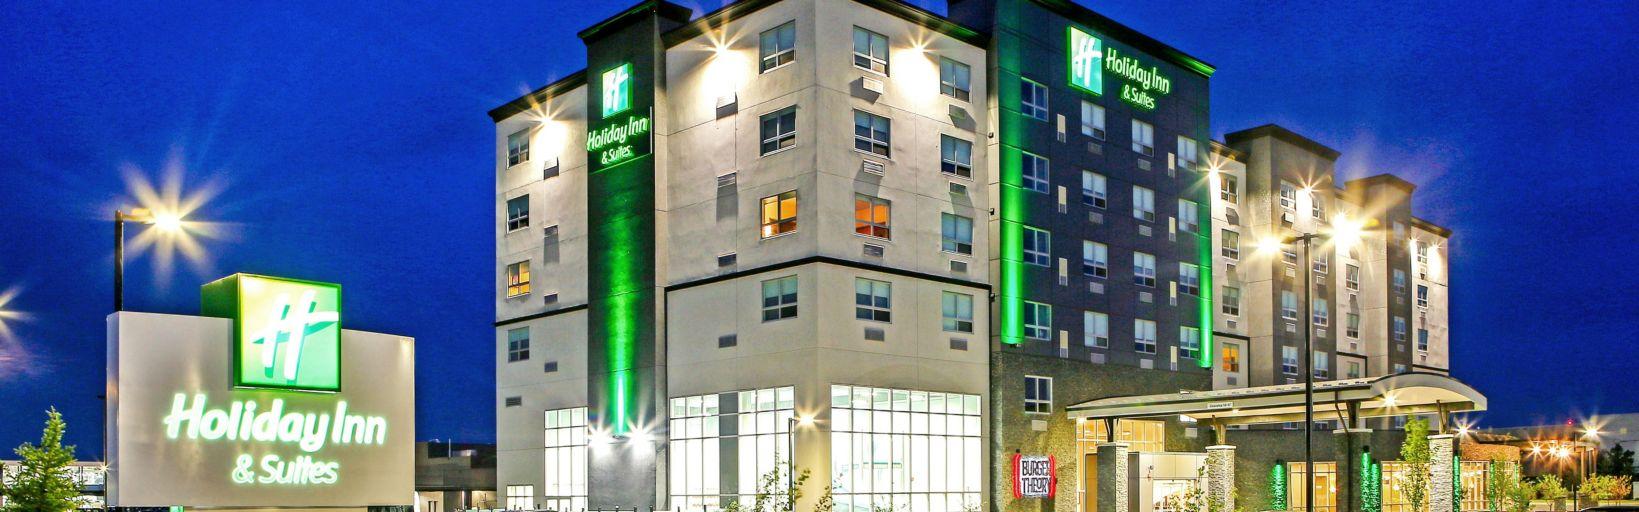 Meeting Room Hotel Exterior